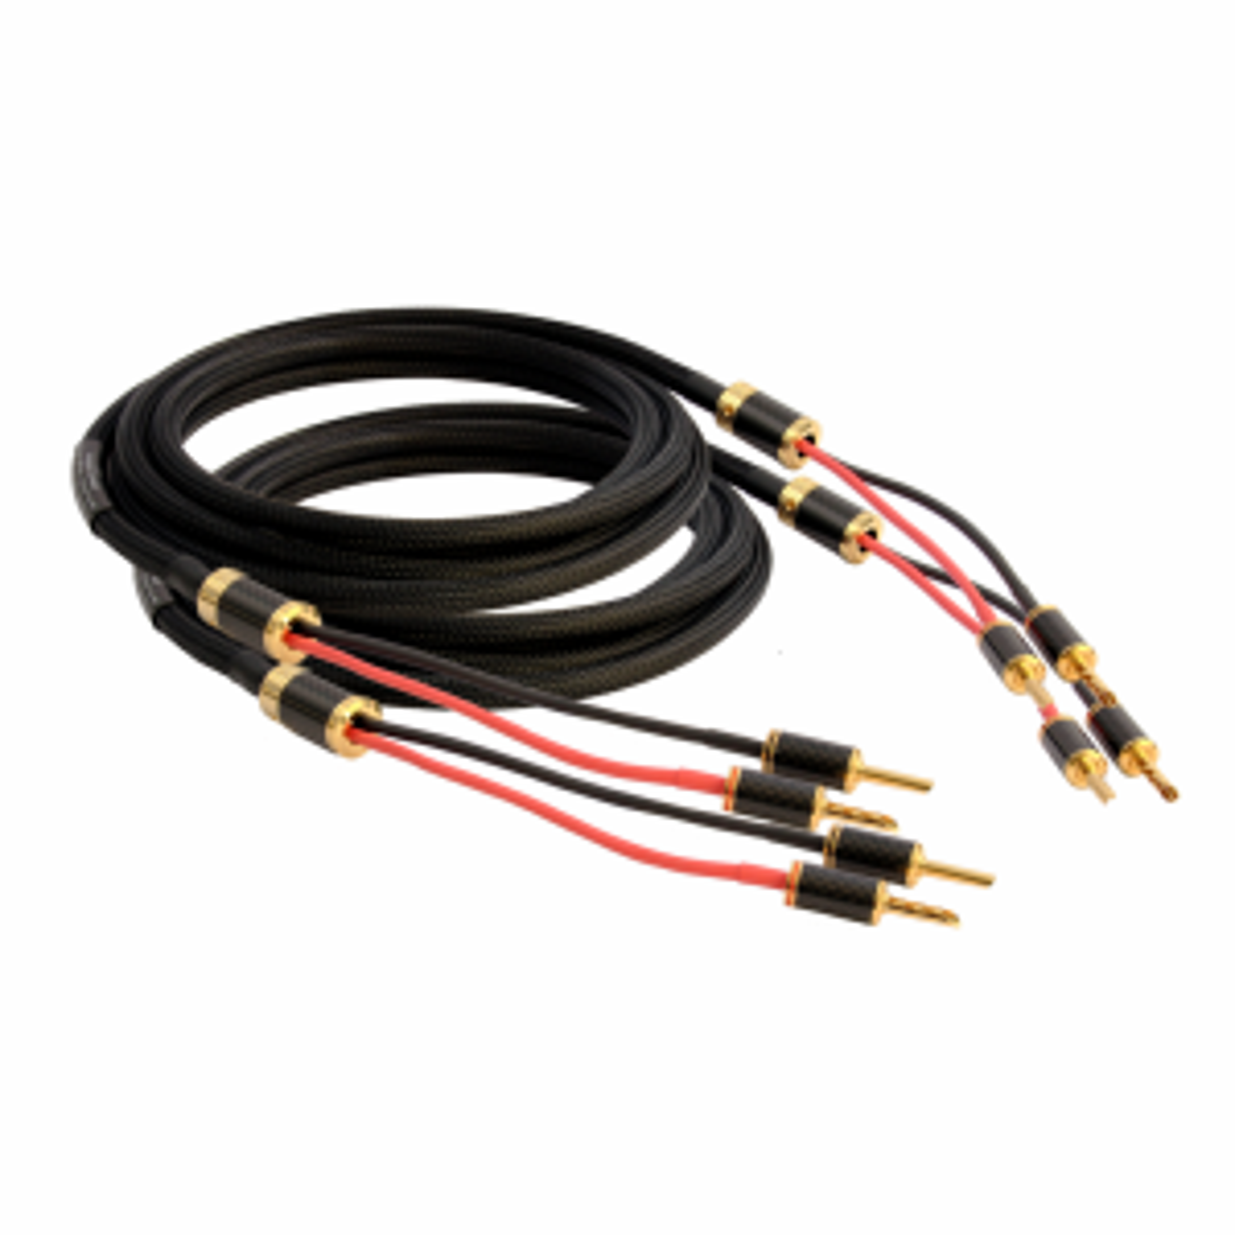 Кабель акустический Goldkabel Black Edition SC Single-Wire 5m